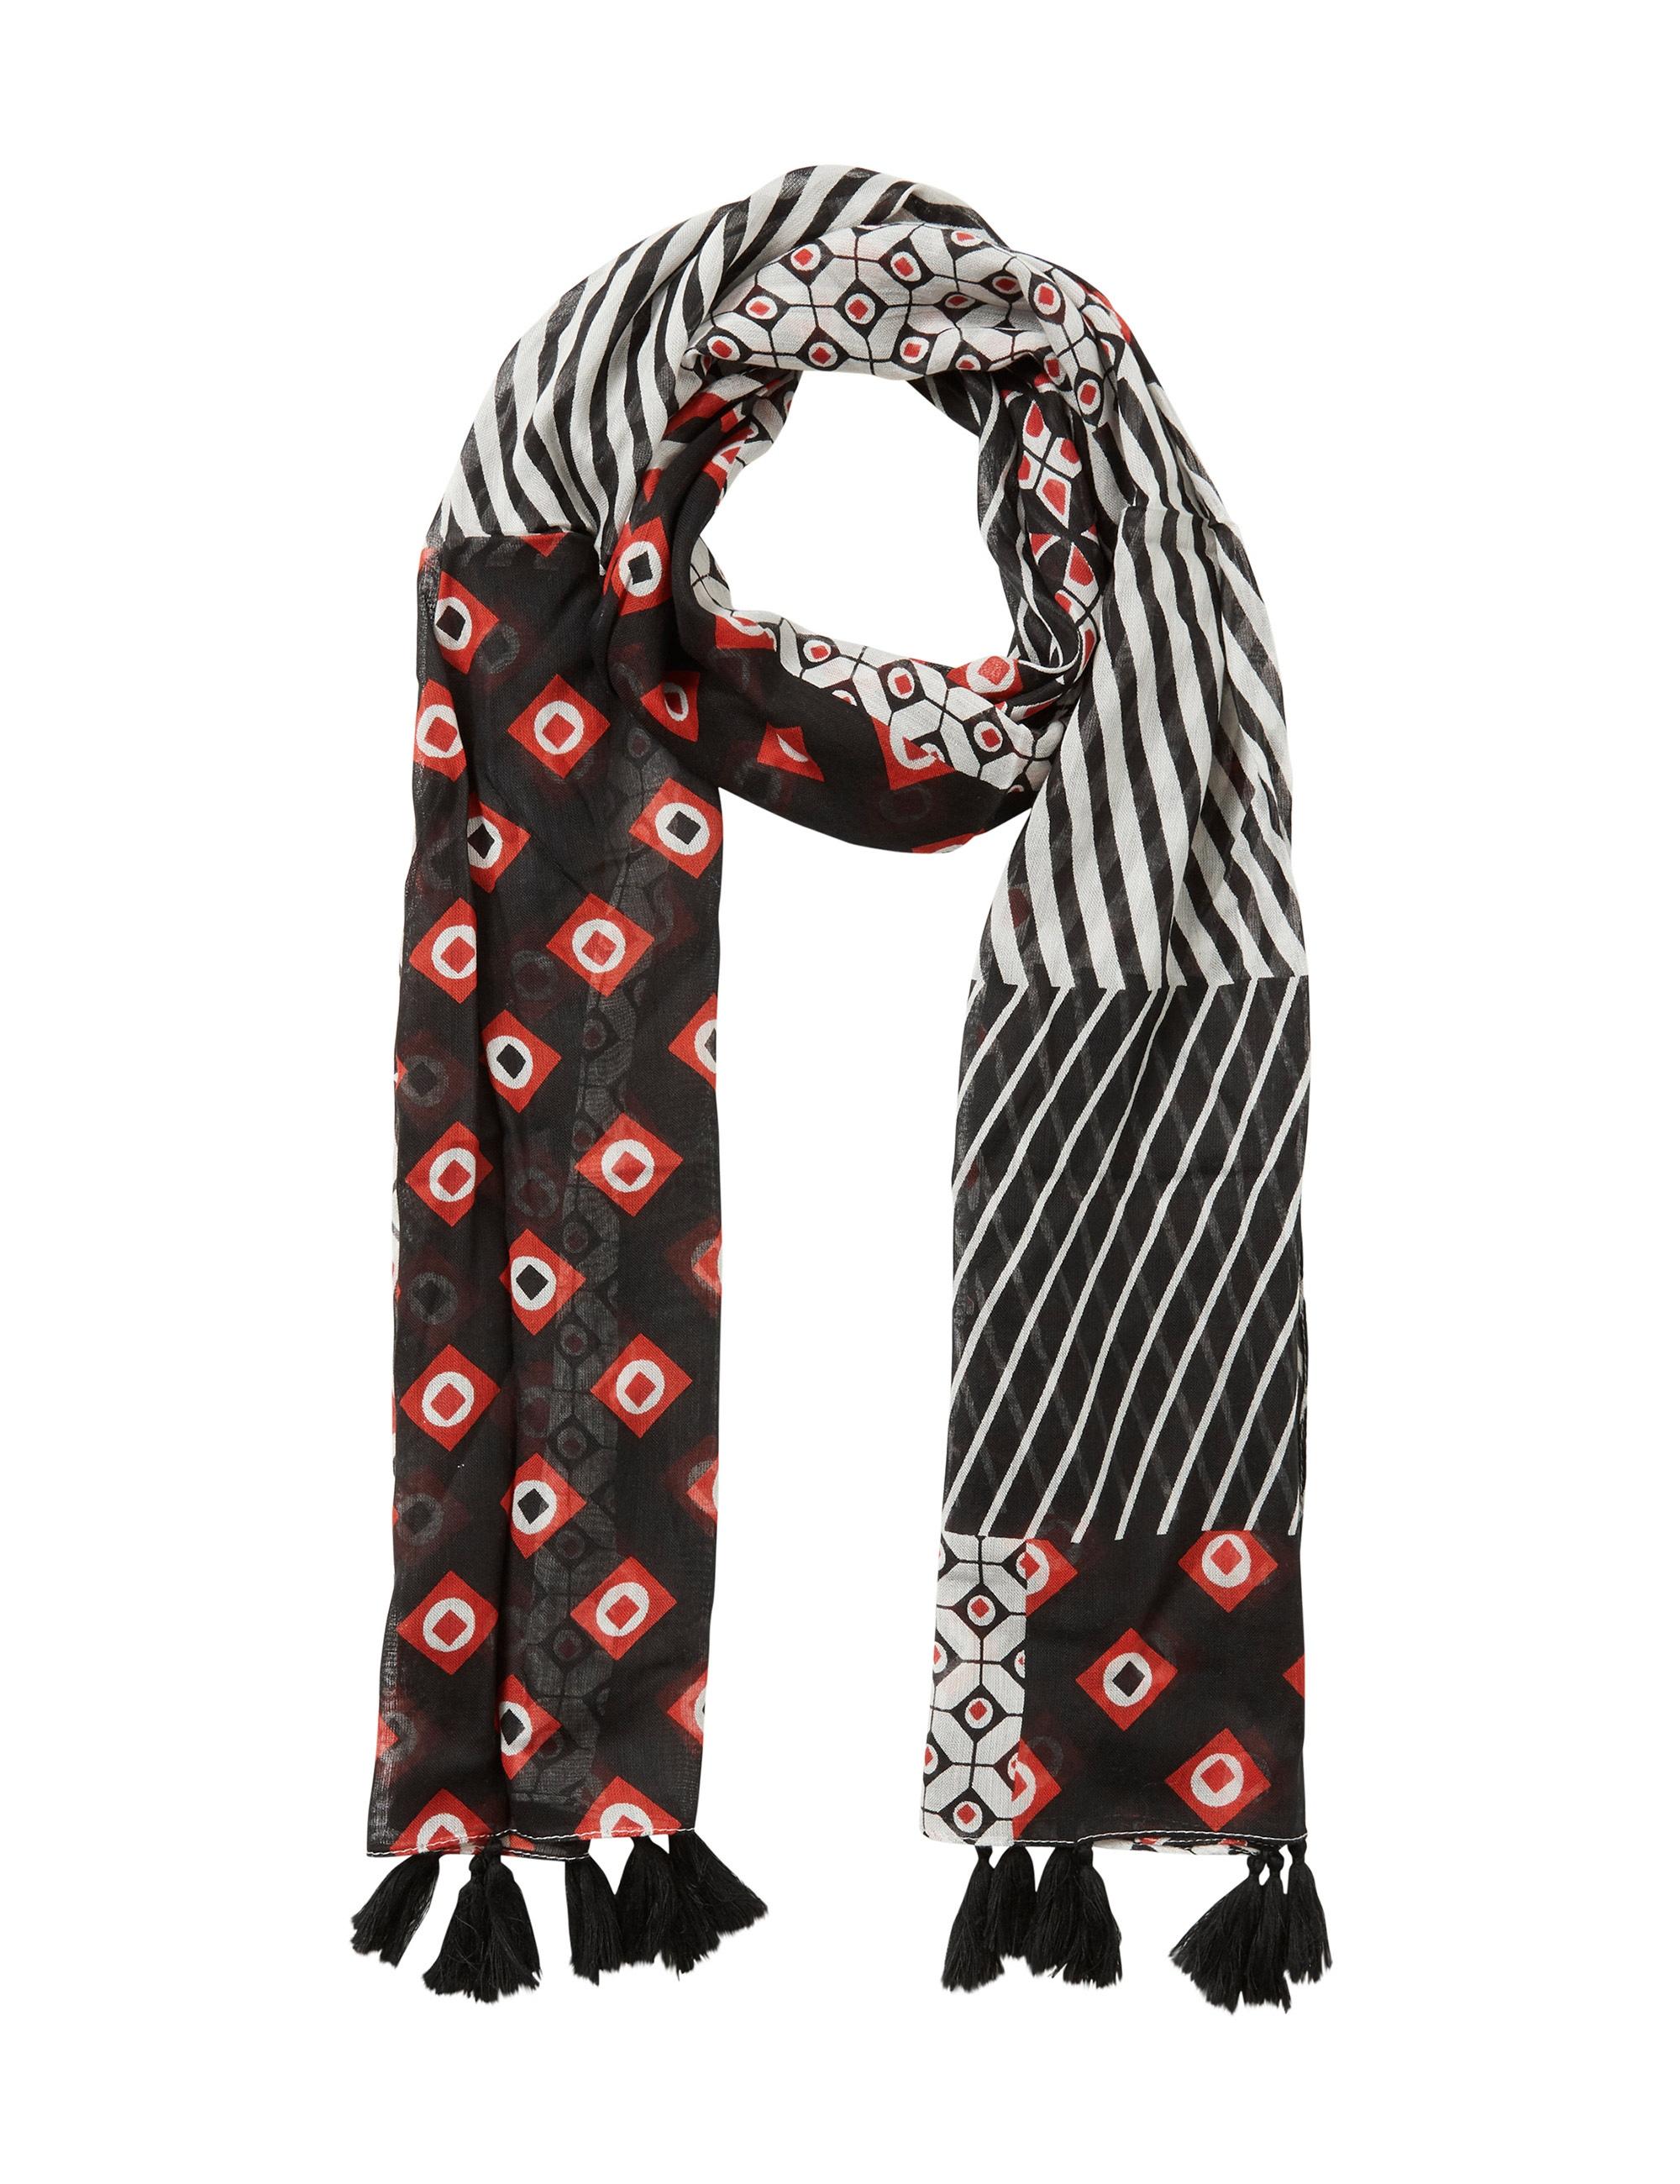 1046627900 1 - Women Fashion